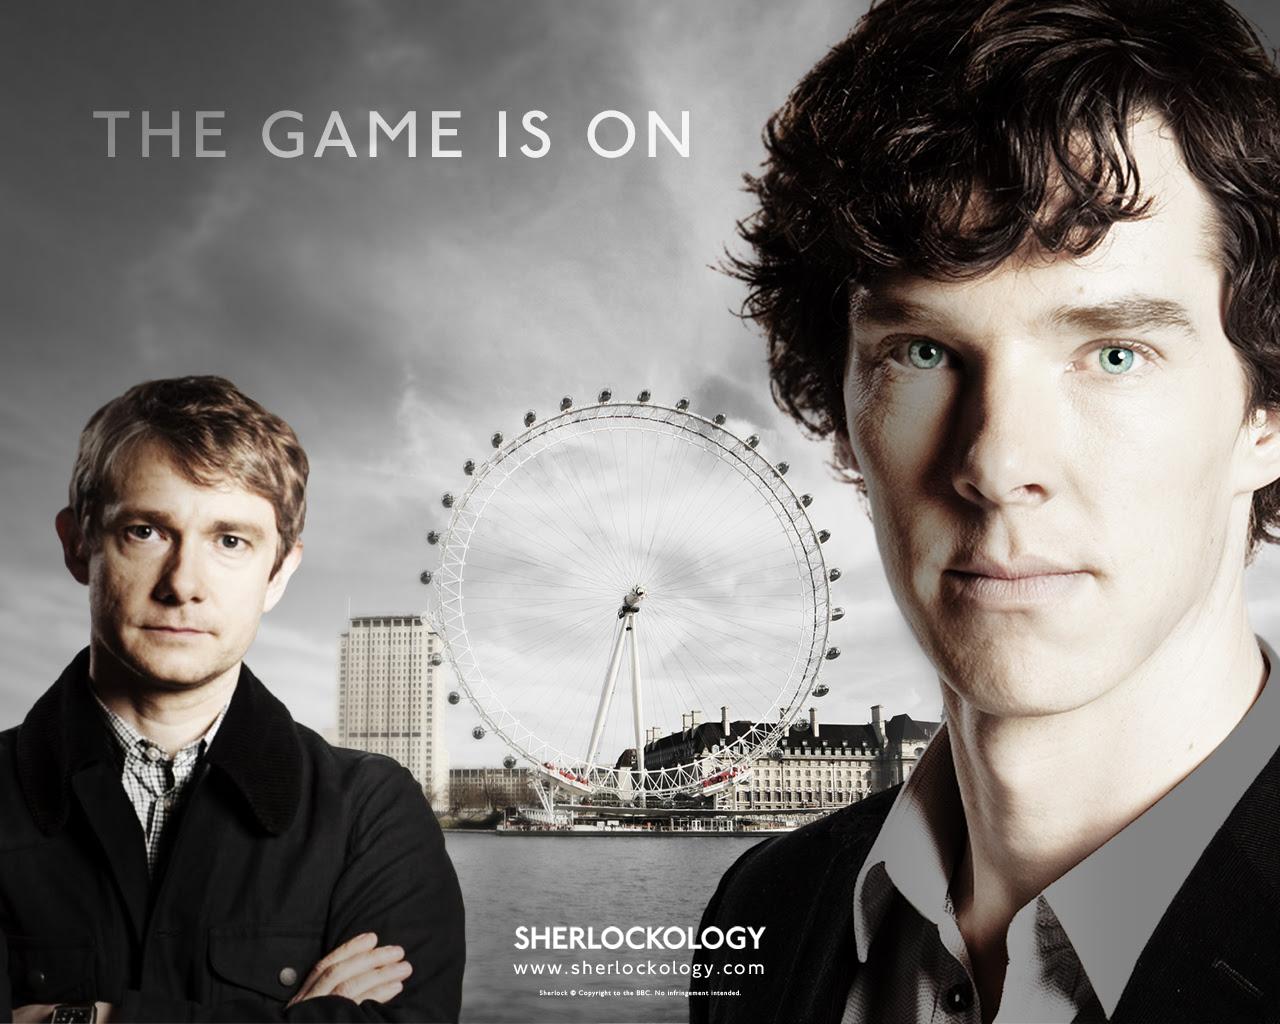 http://lexirambles.files.wordpress.com/2014/01/bbc-sherlock-season-3-the-empty-hearse.jpg